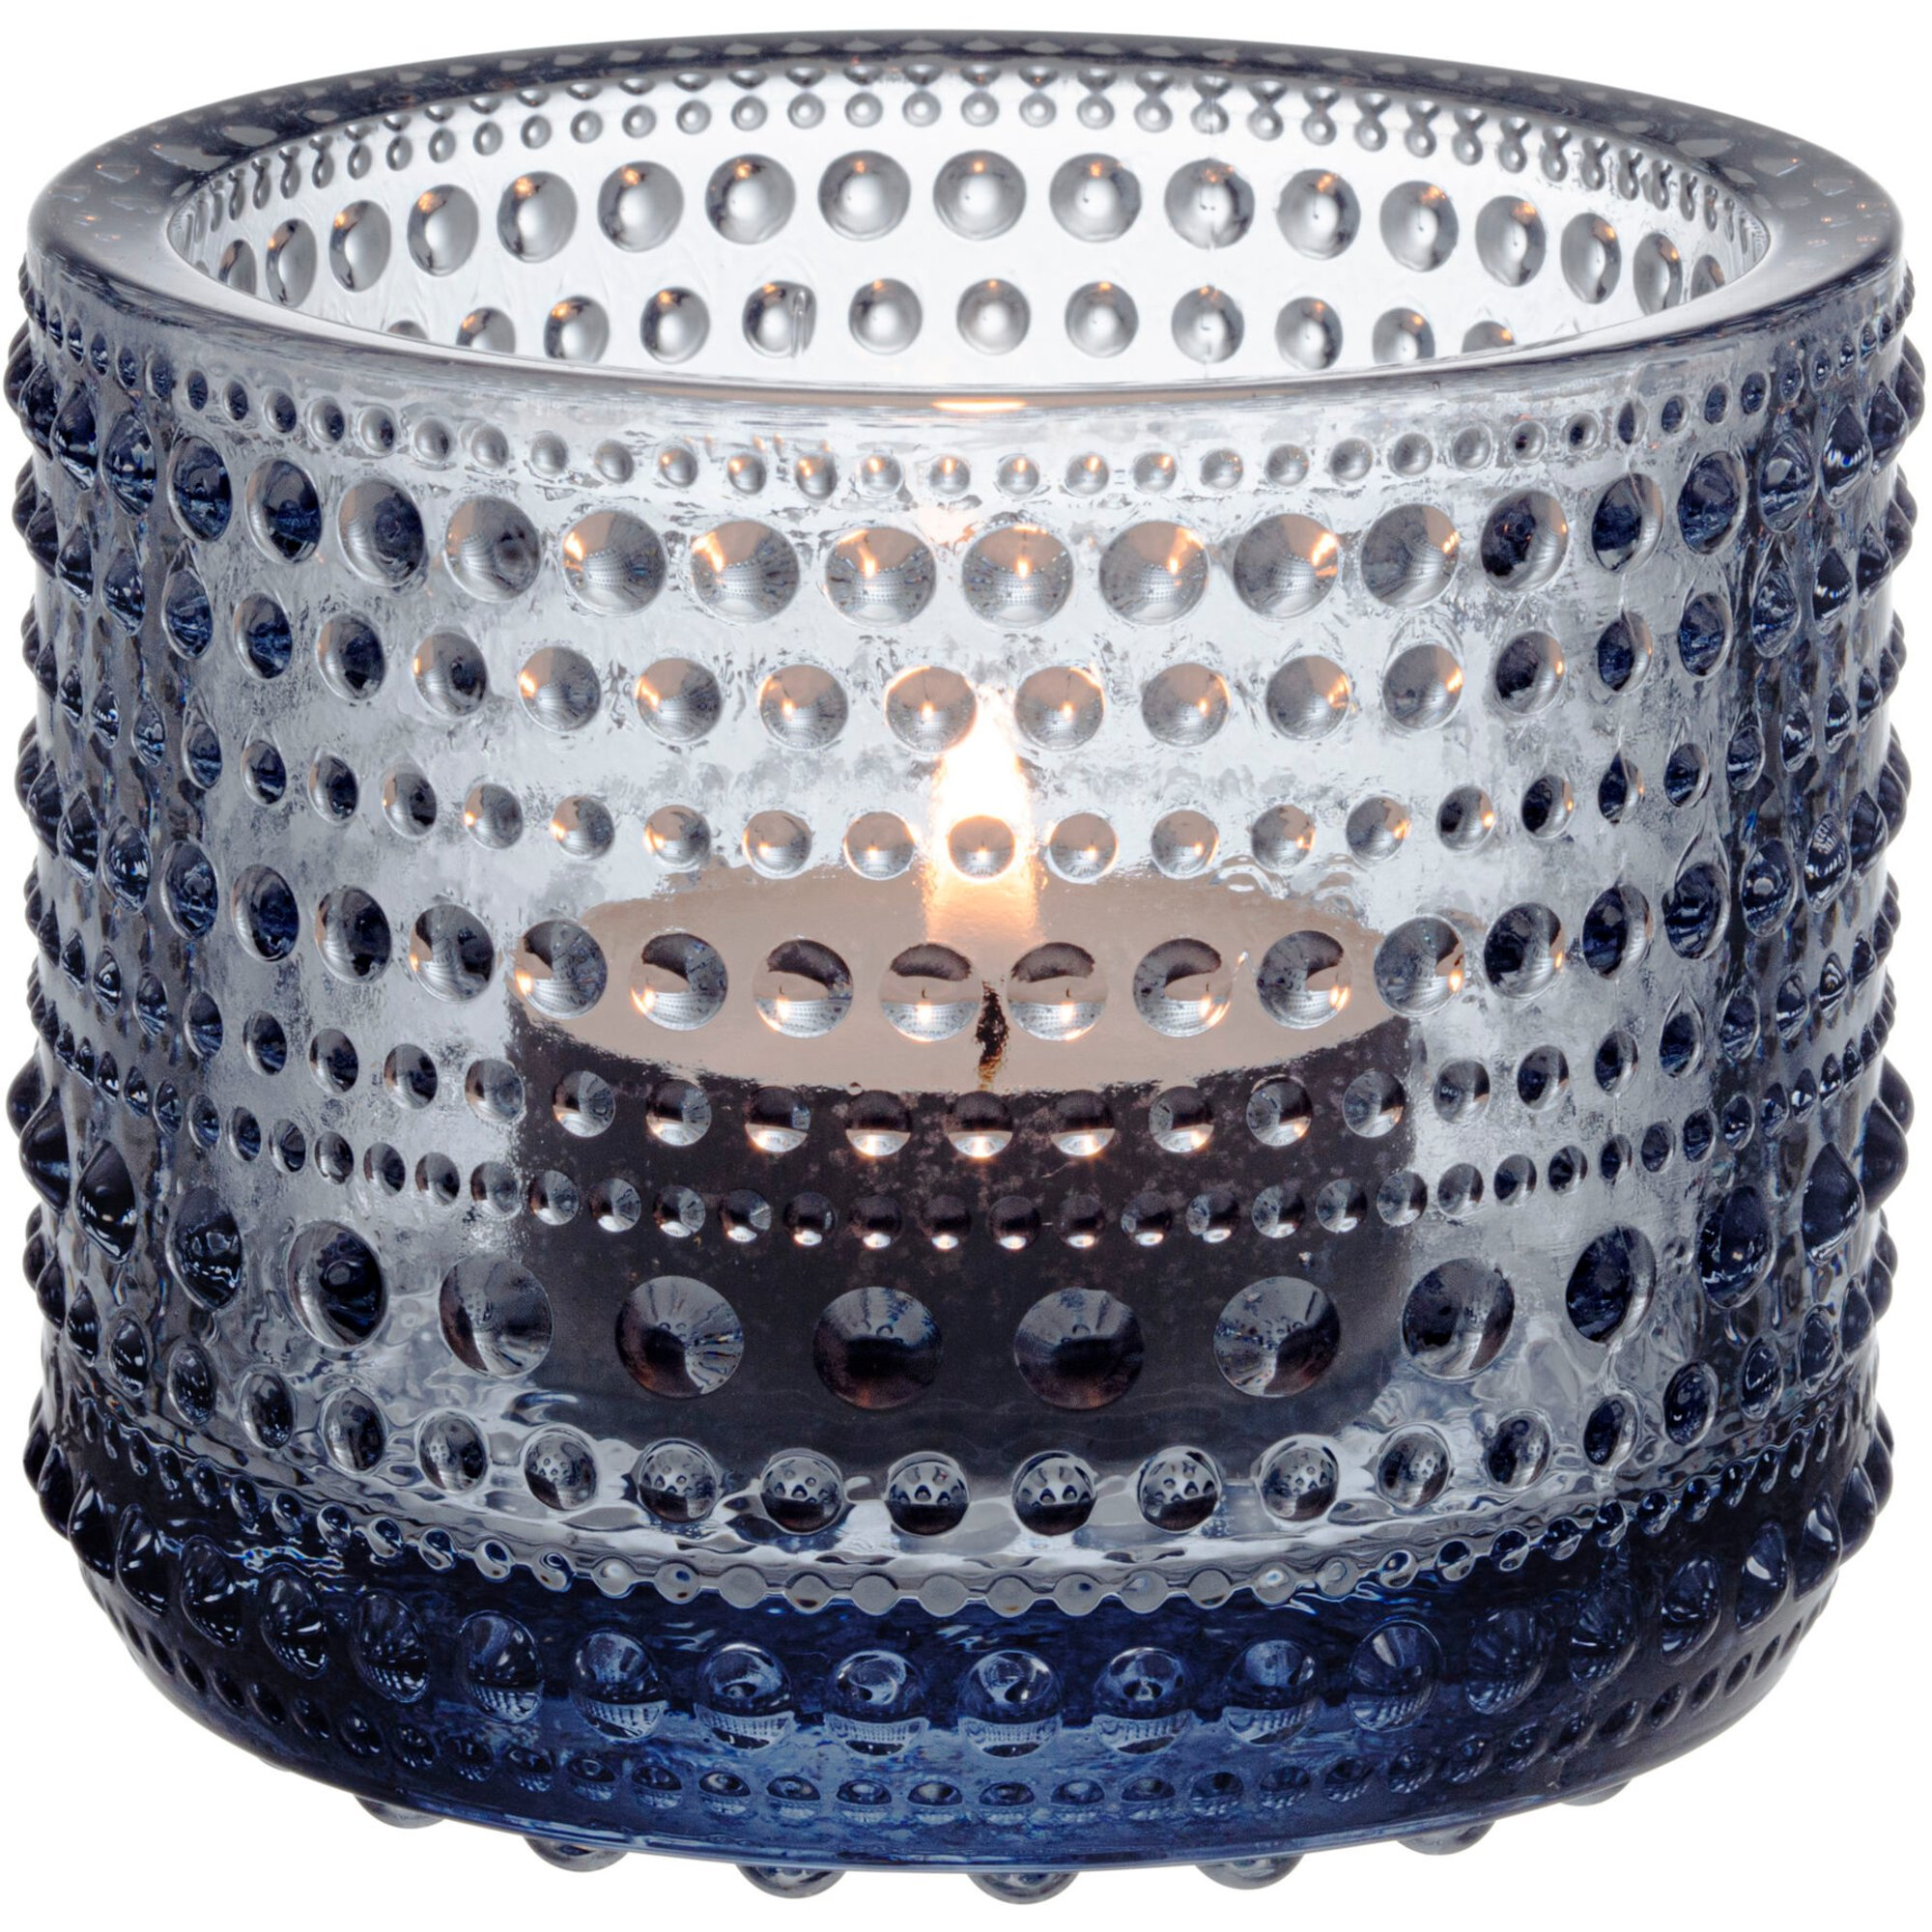 Iittala Kastehelmi Återvunnet Glas Ljuslykta 6,4 cm.